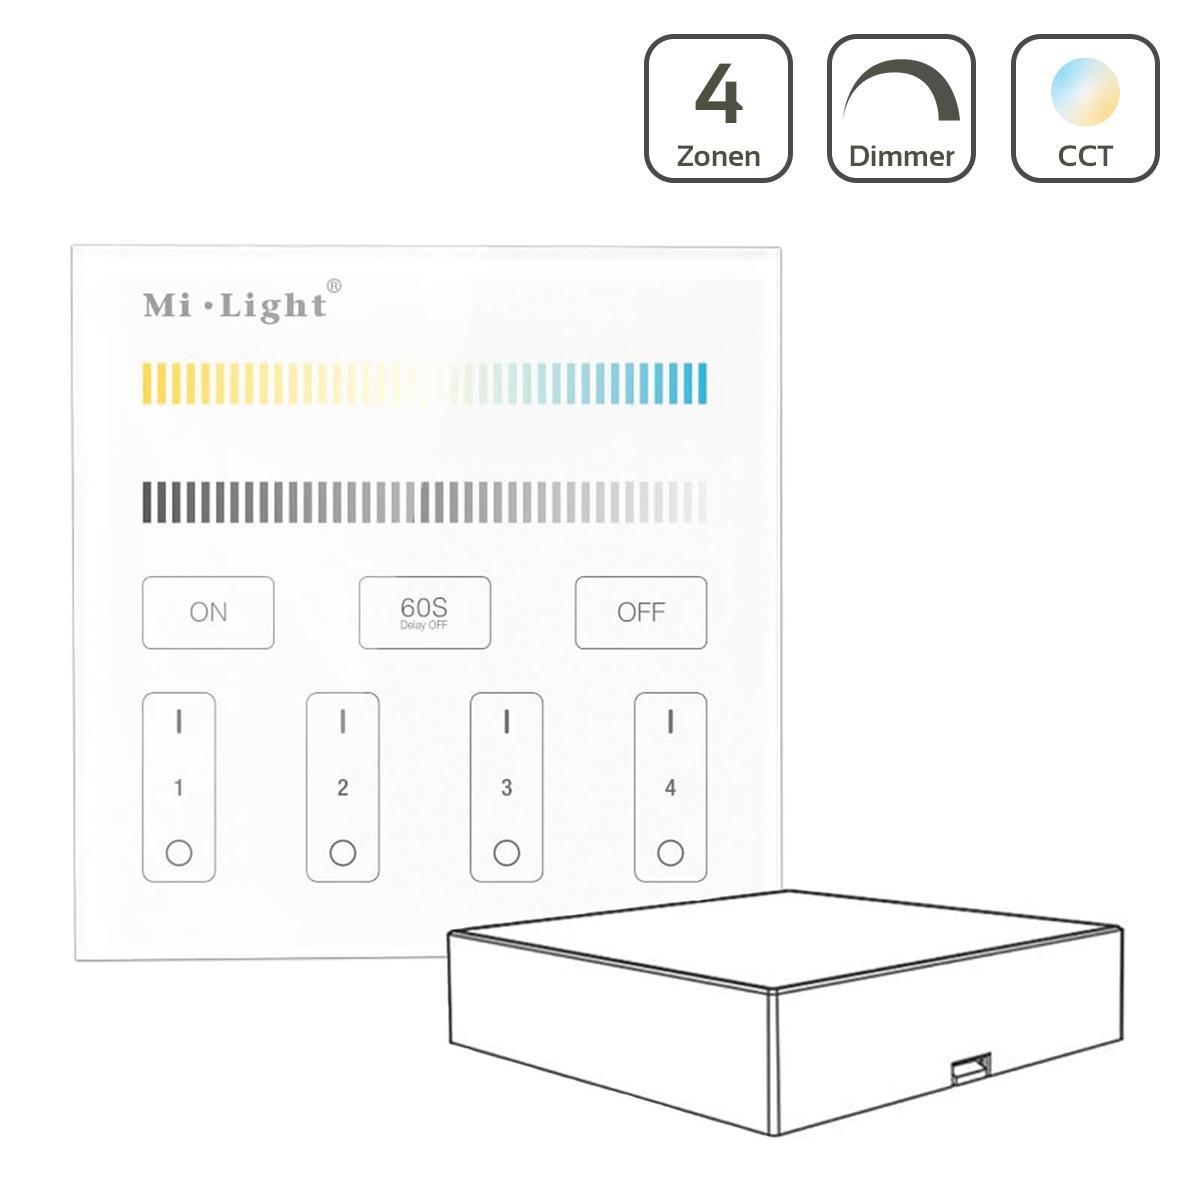 MiBoxer CCT Wandschalter 4 Zonen Aufbau Dimmen Schalten Farbsteuerung batteriebetrieben B2